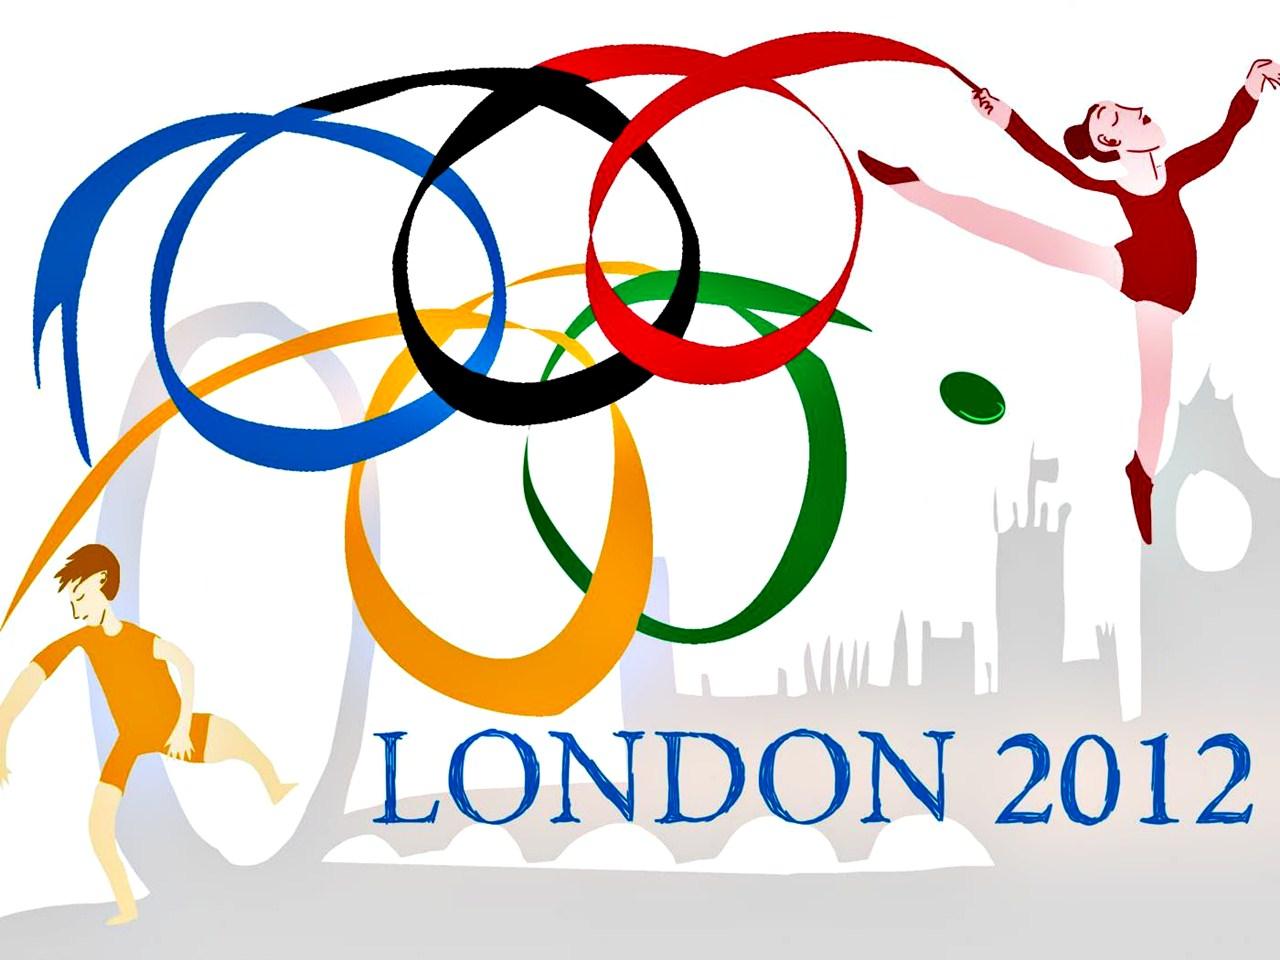 http://2.bp.blogspot.com/-VvFGMZp4j78/T_i7nLyMQWI/AAAAAAAAA3w/UM_J-hpEiYY/s1600/London+Olympic+Wallpaper.jpg